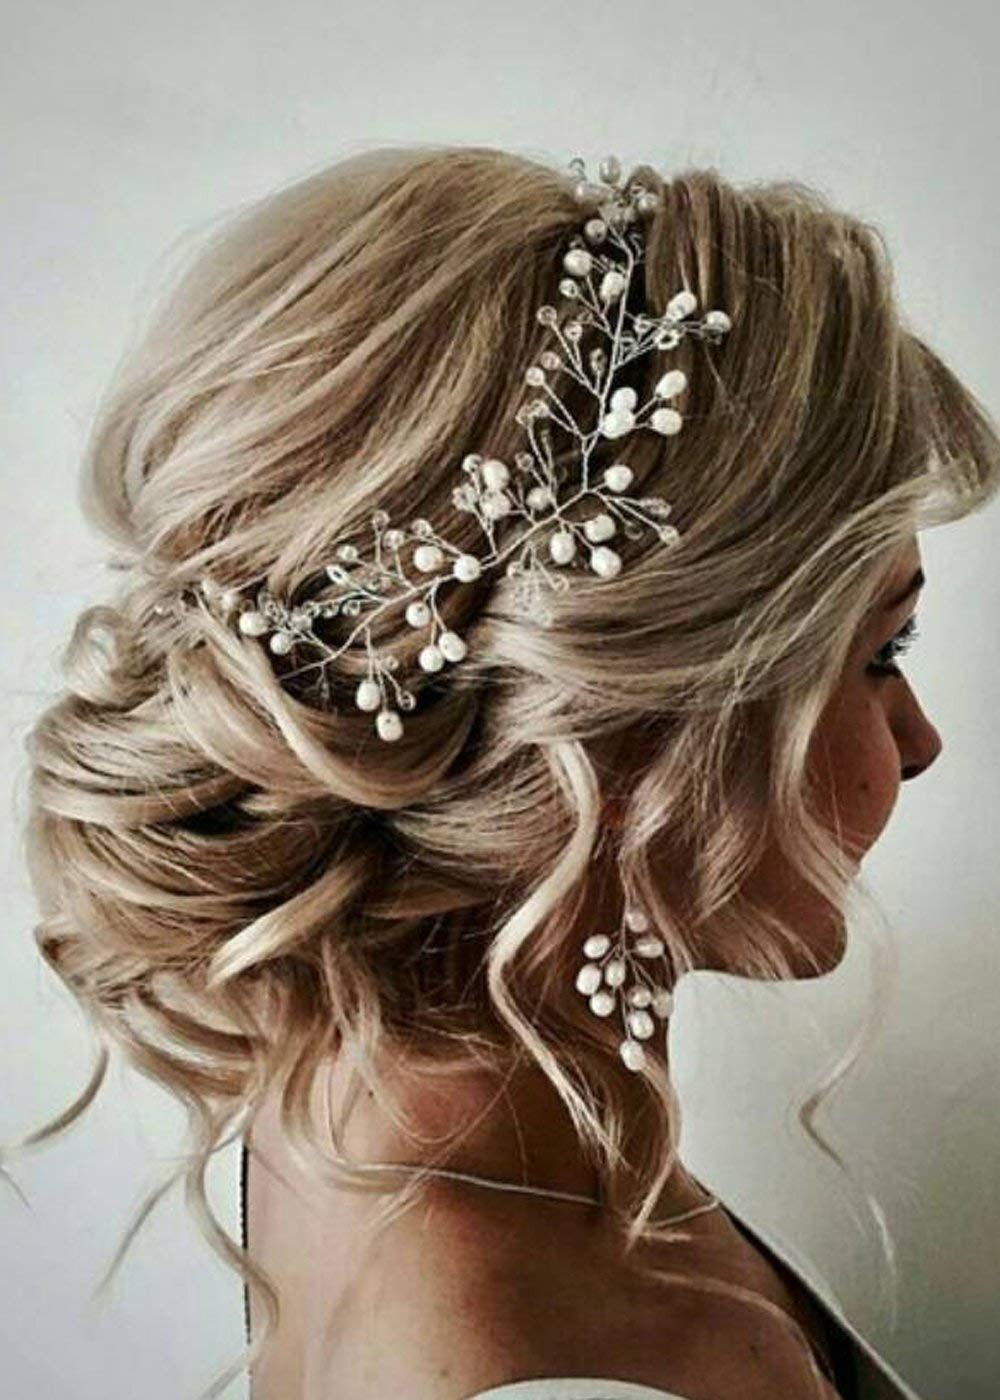 Fxmimior Bridal Rose Gold Leaf Headband Earrings Set Wedding Hair